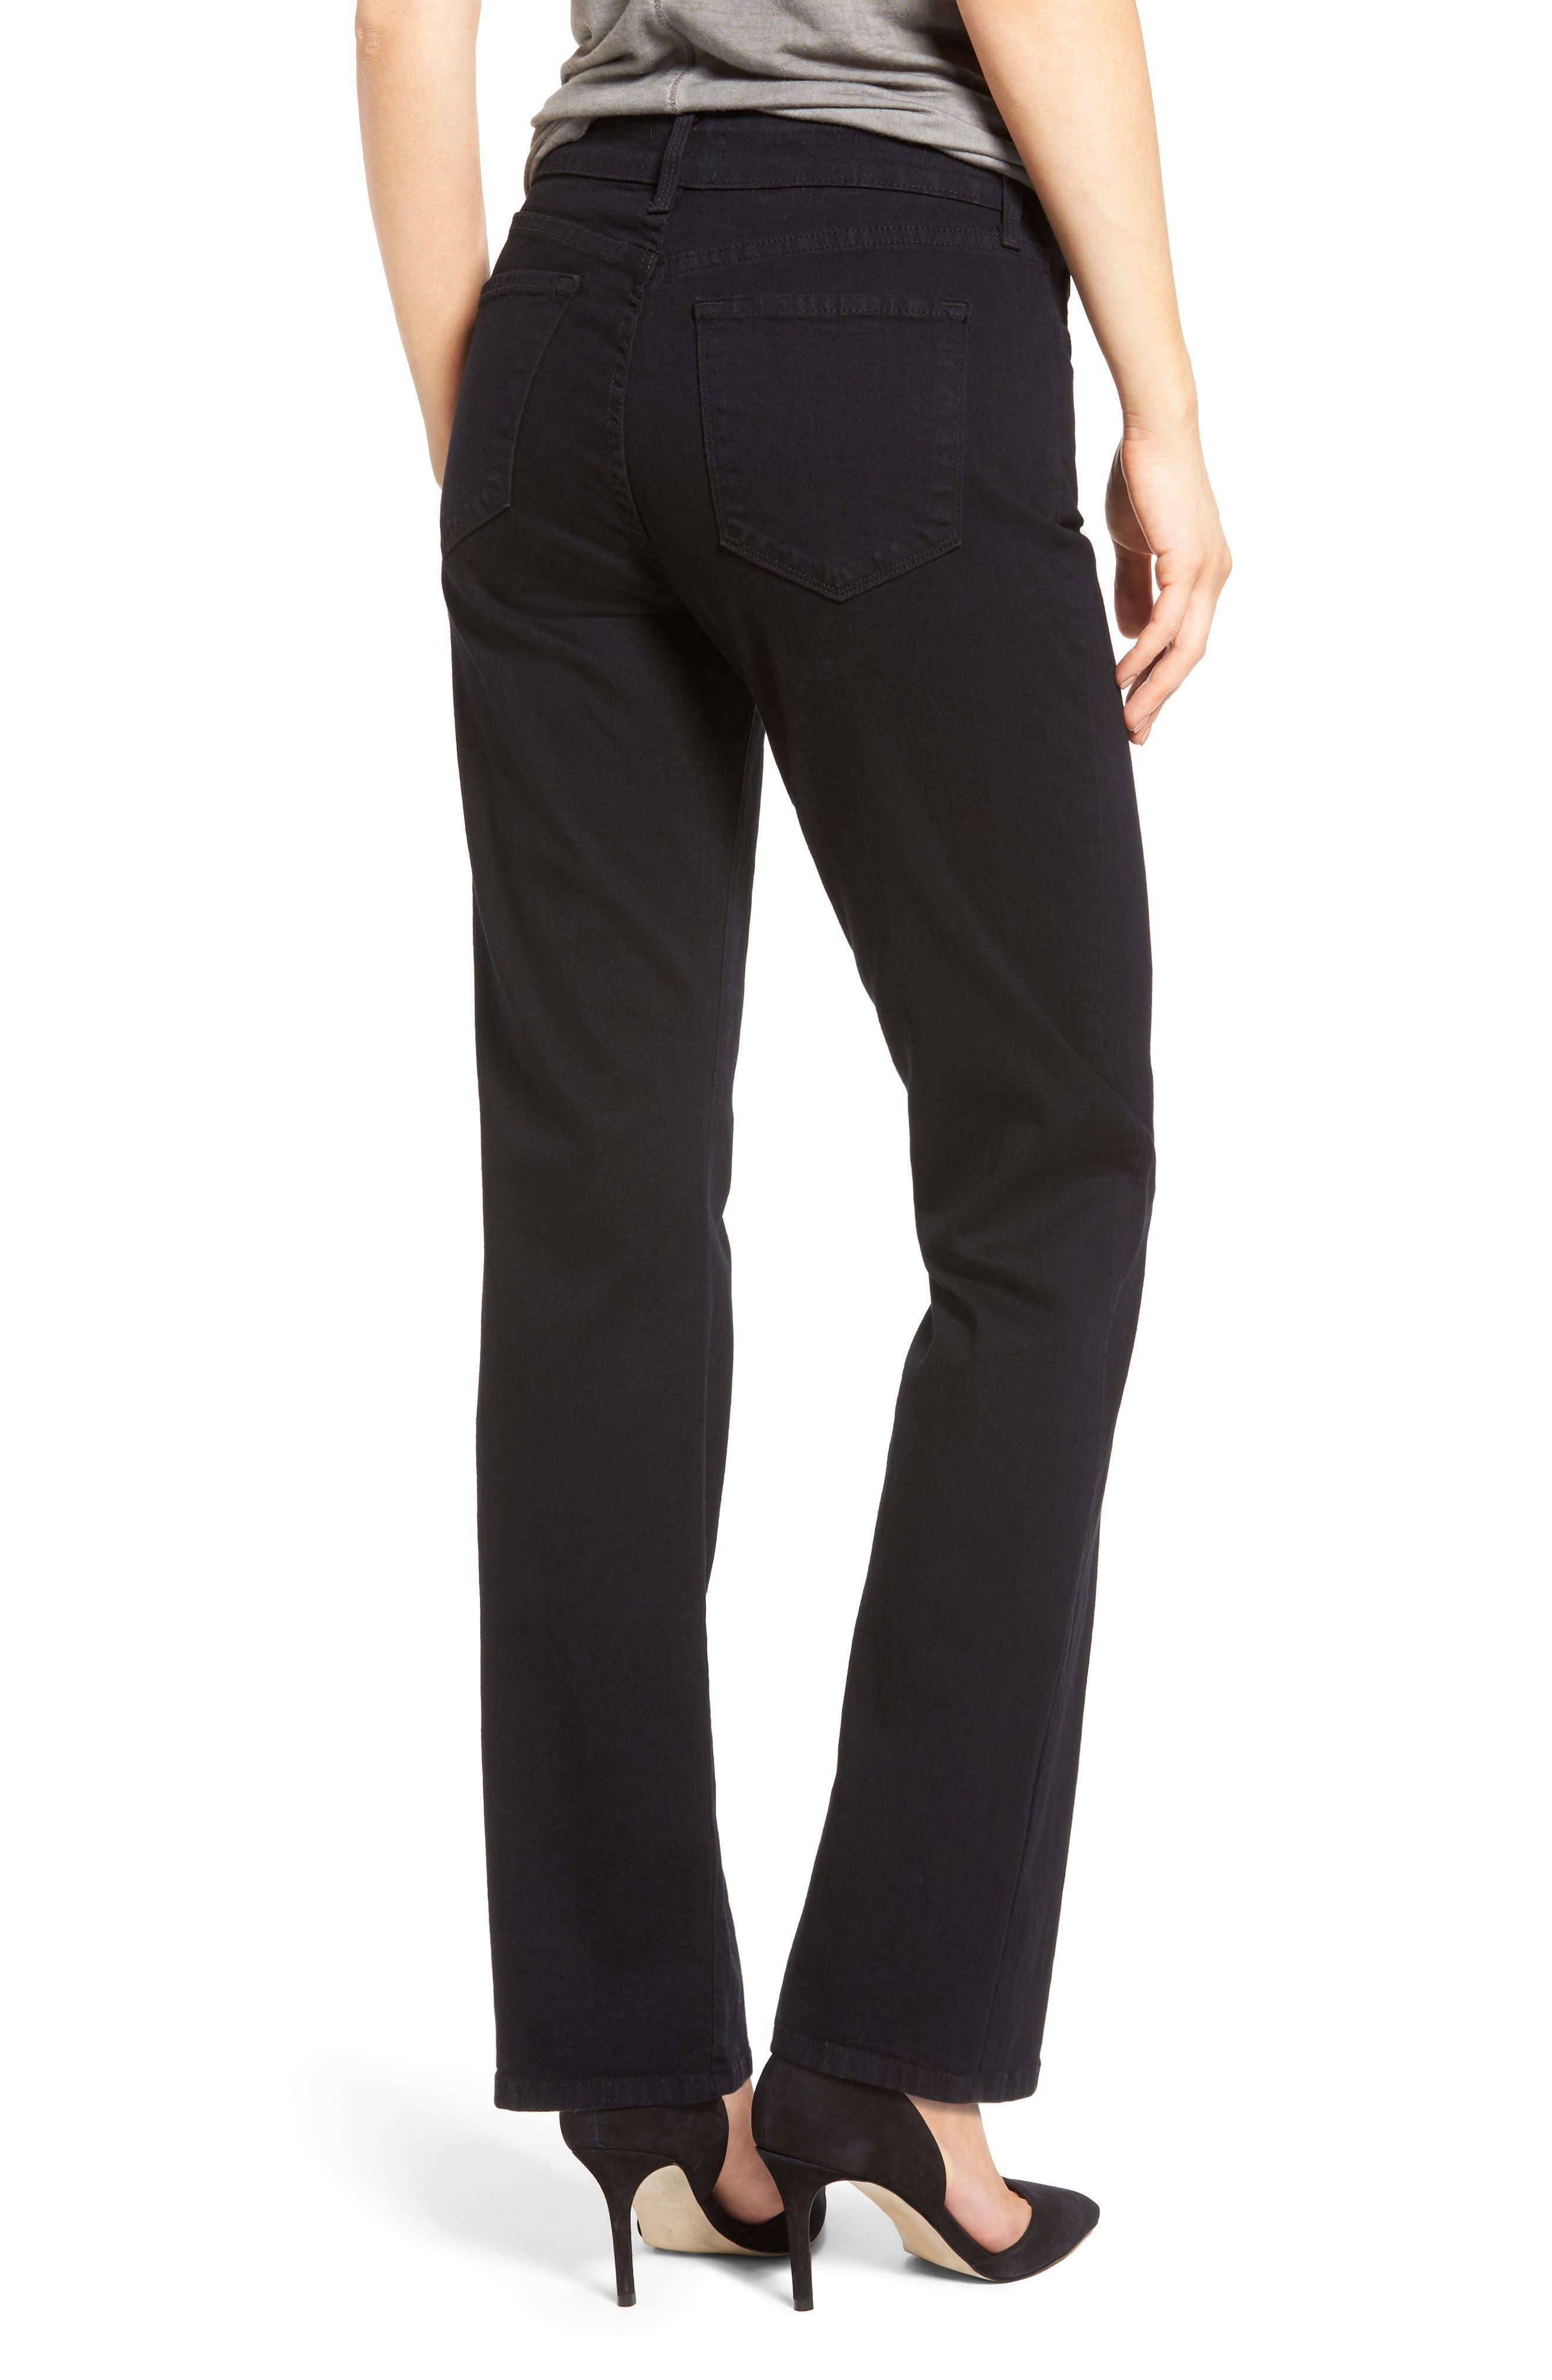 NYDJ,                             Marilyn High Waist Stretch Straight Leg Jeans,                             Alternate thumbnail 2, color,                             BLACK